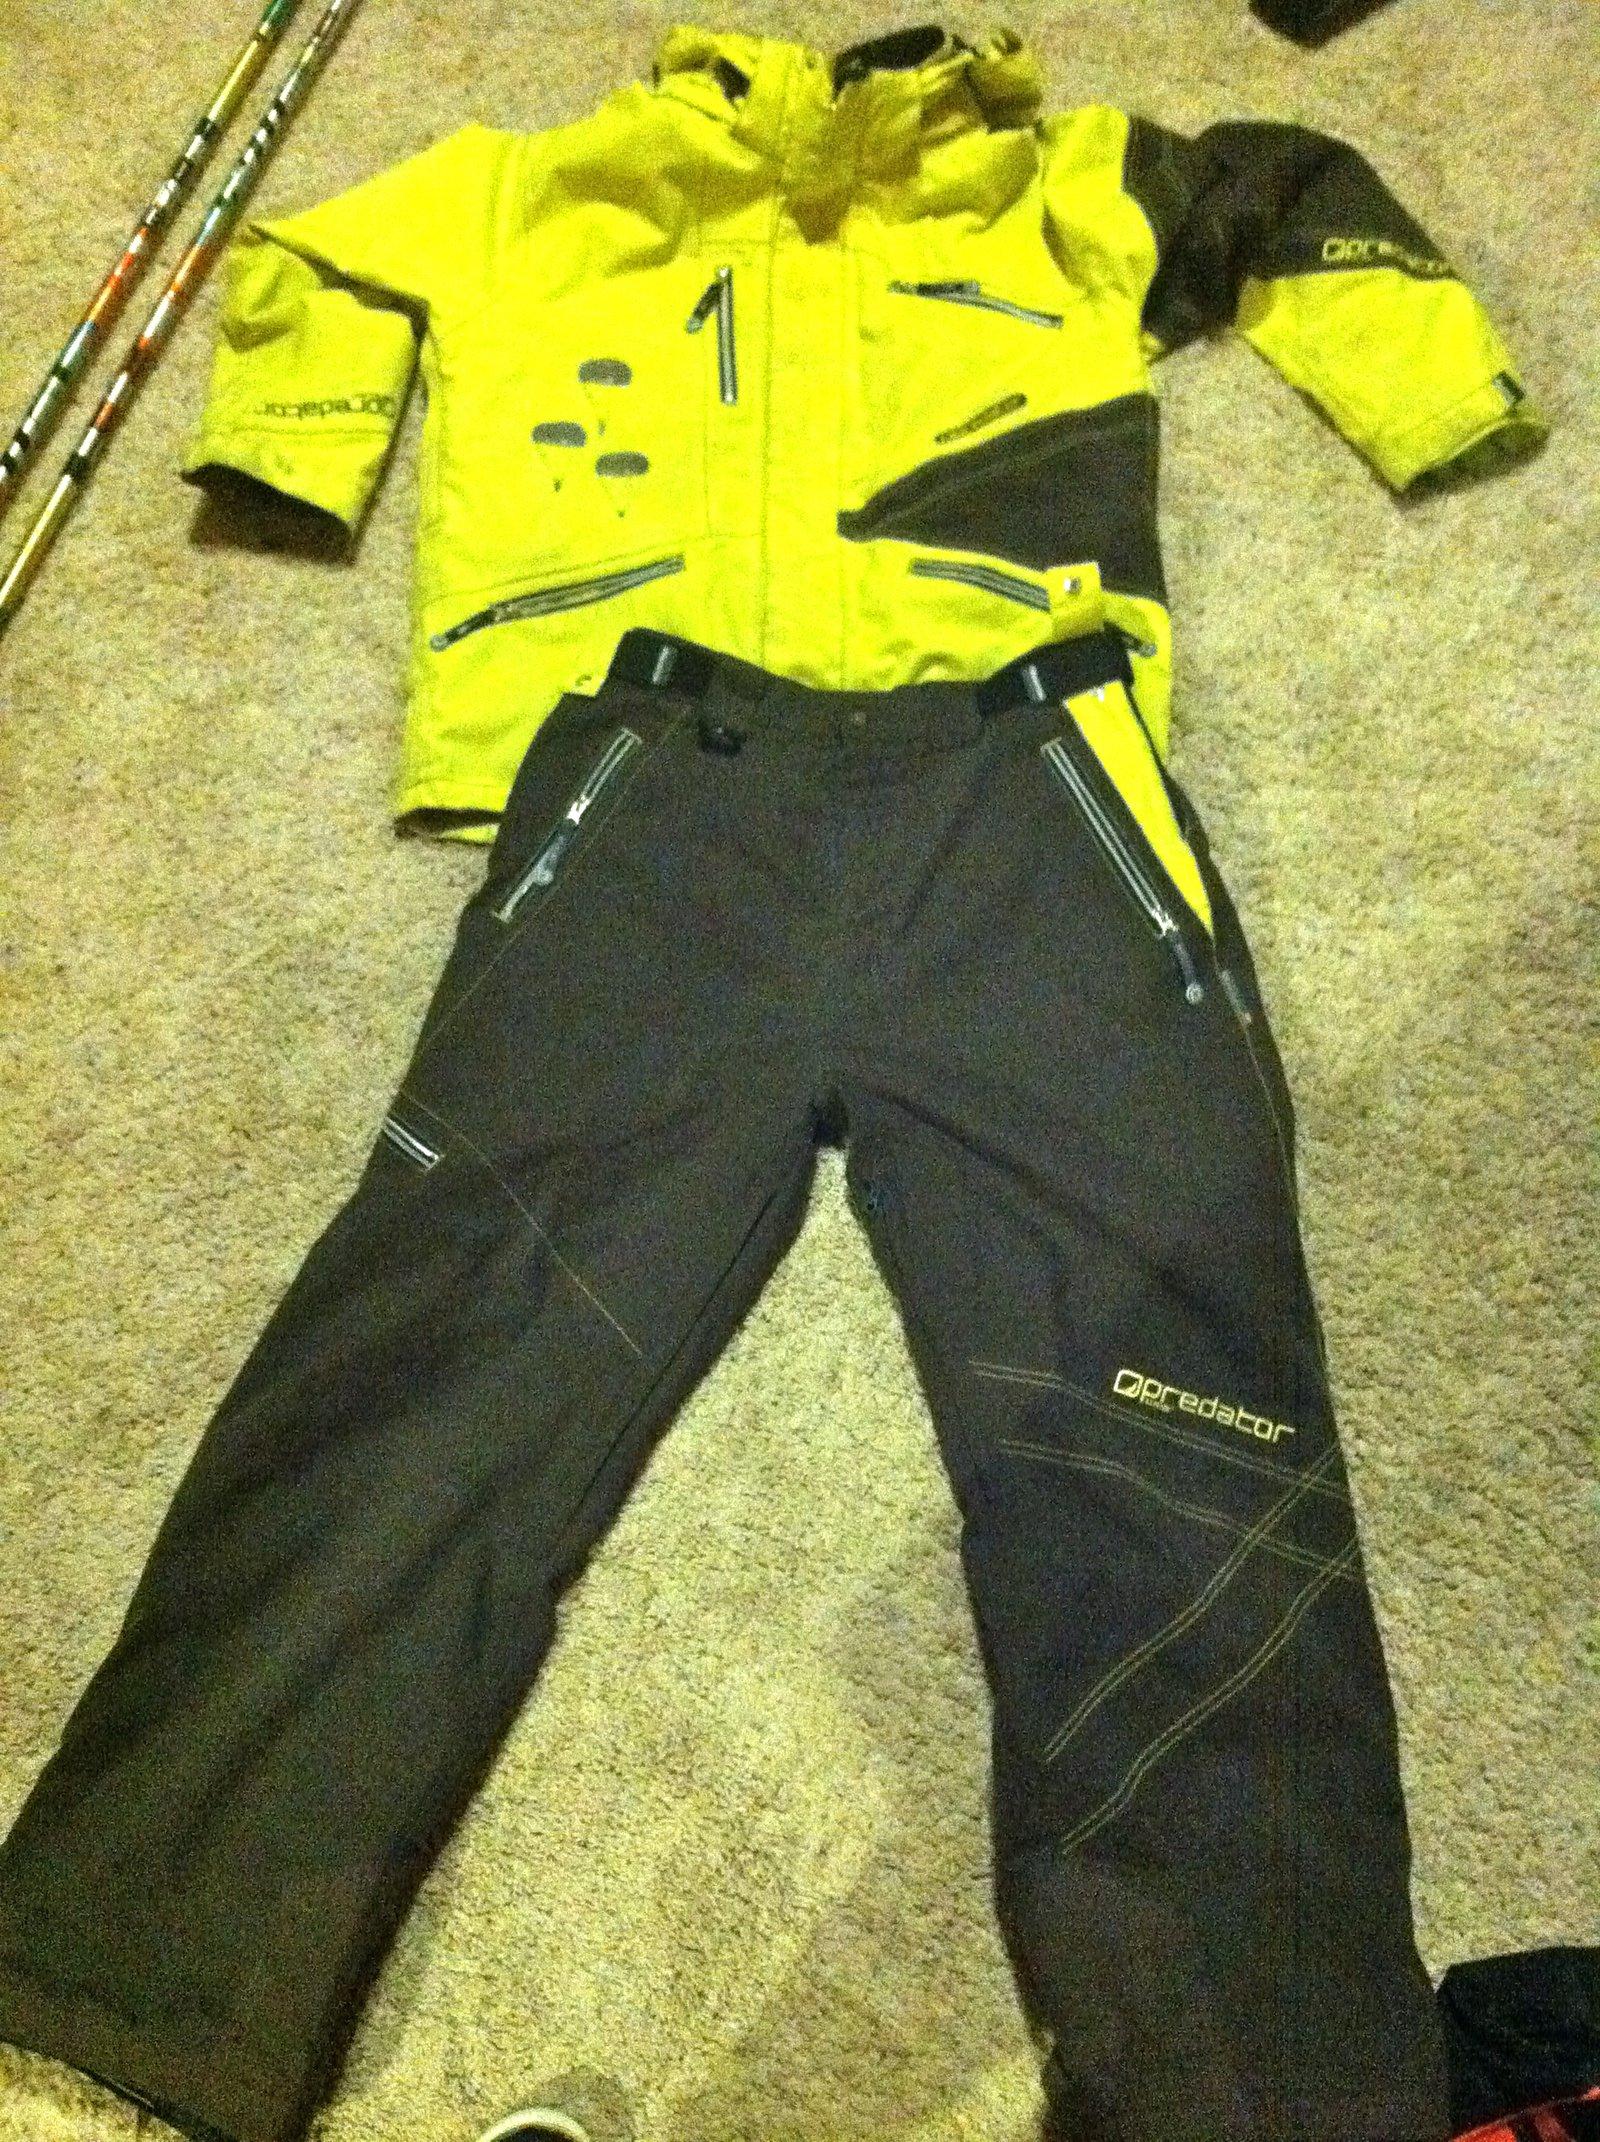 Outerwear kit